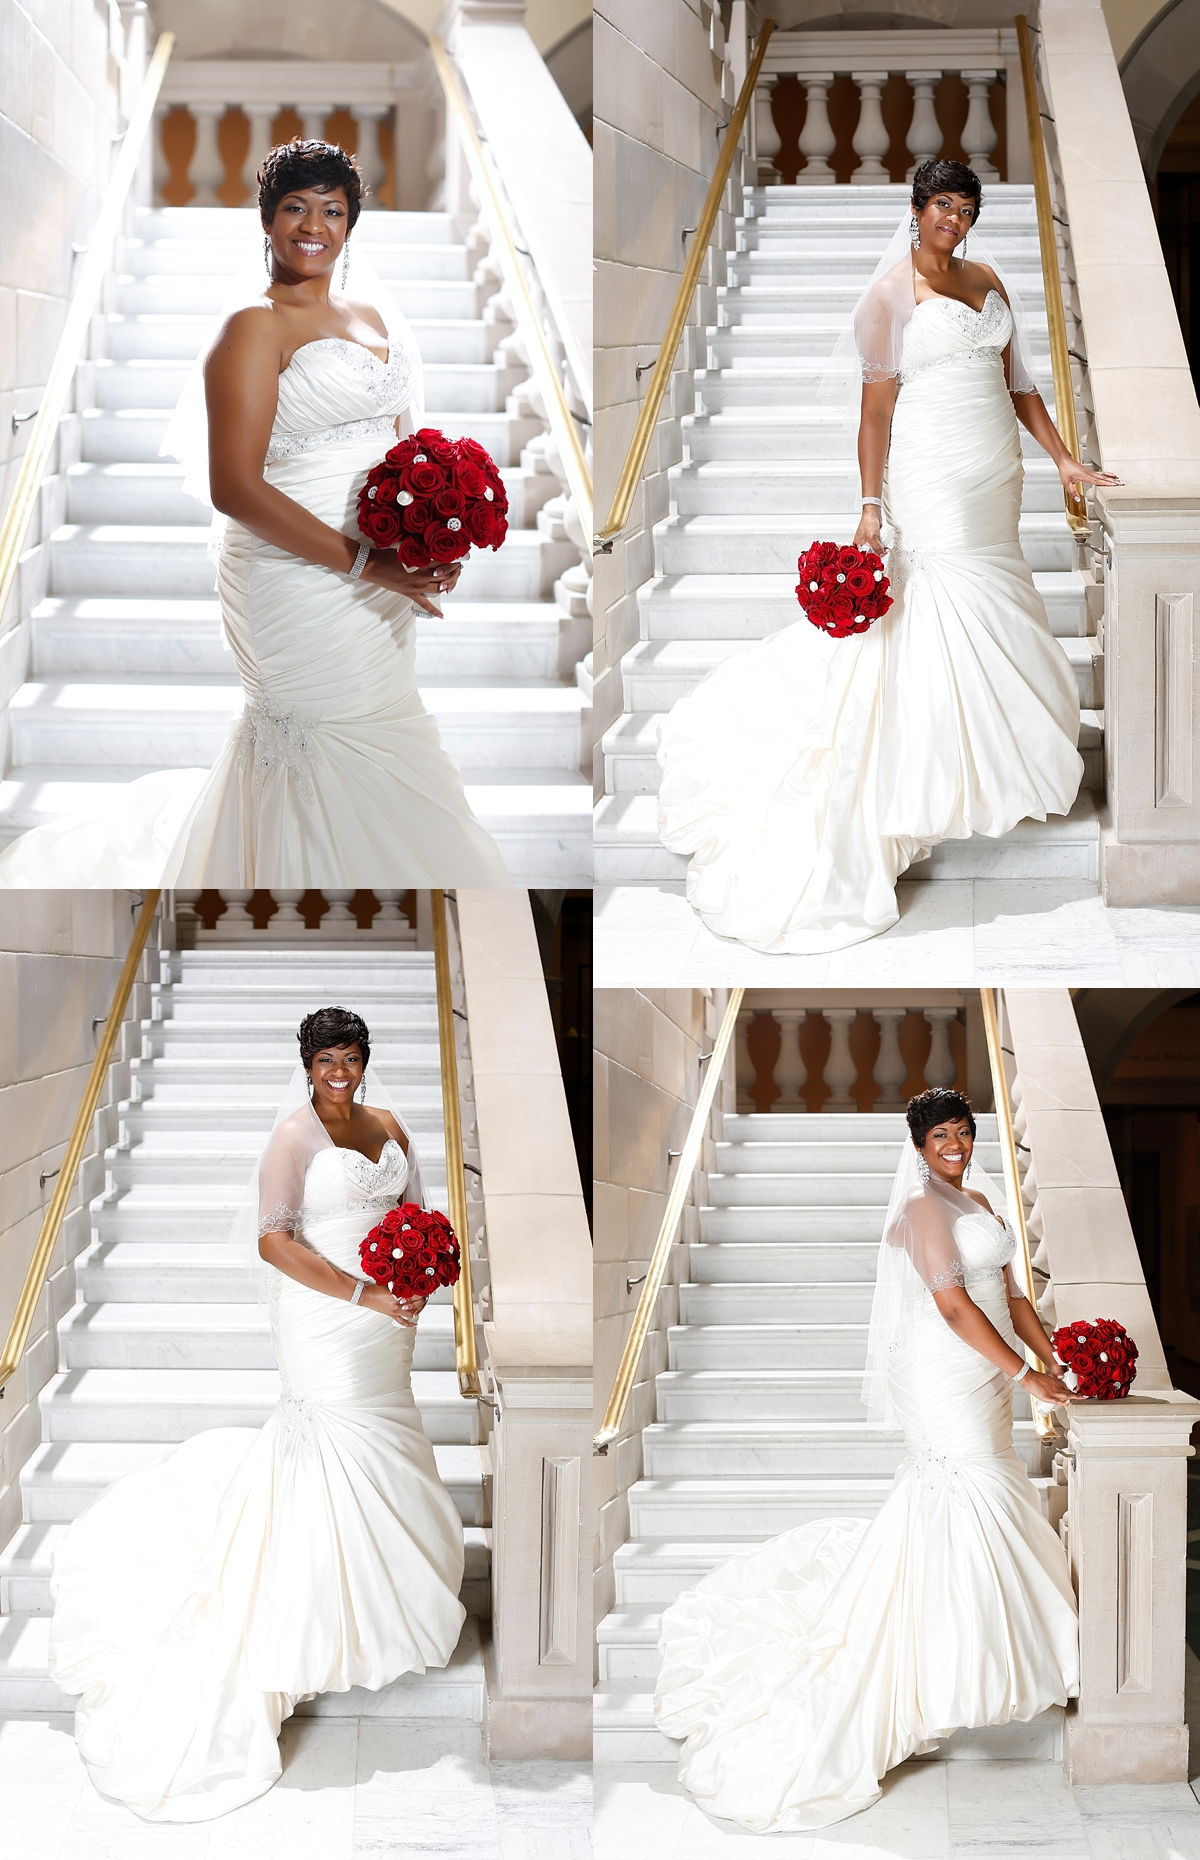 Chrysler Museum of Art Wedding Photographer | Nicole's Bridal Portrait Session!